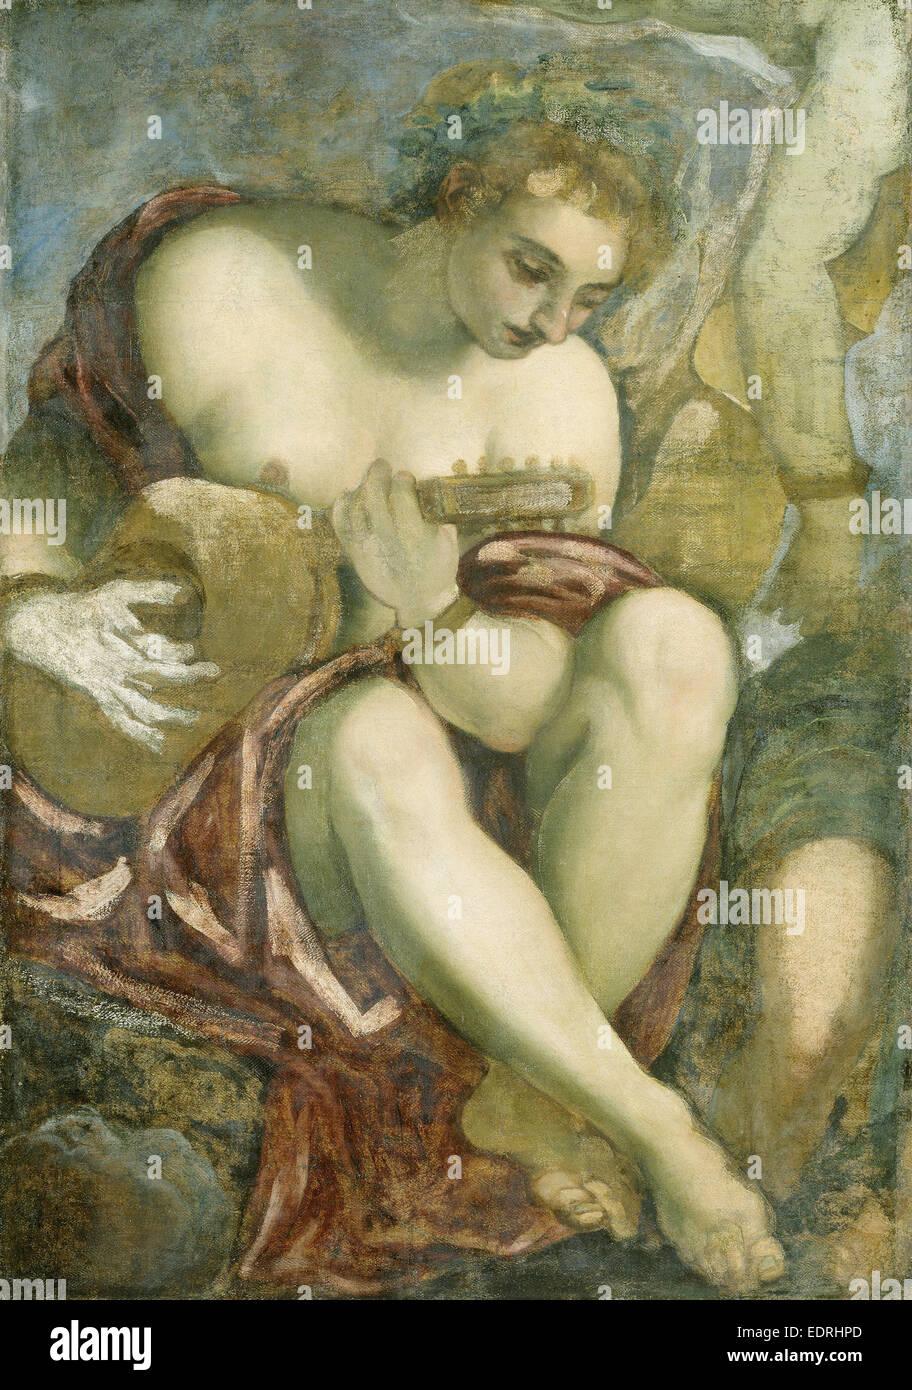 Muse mit Laute, Jacopo Tintoretto, 1528-1594 Stockbild